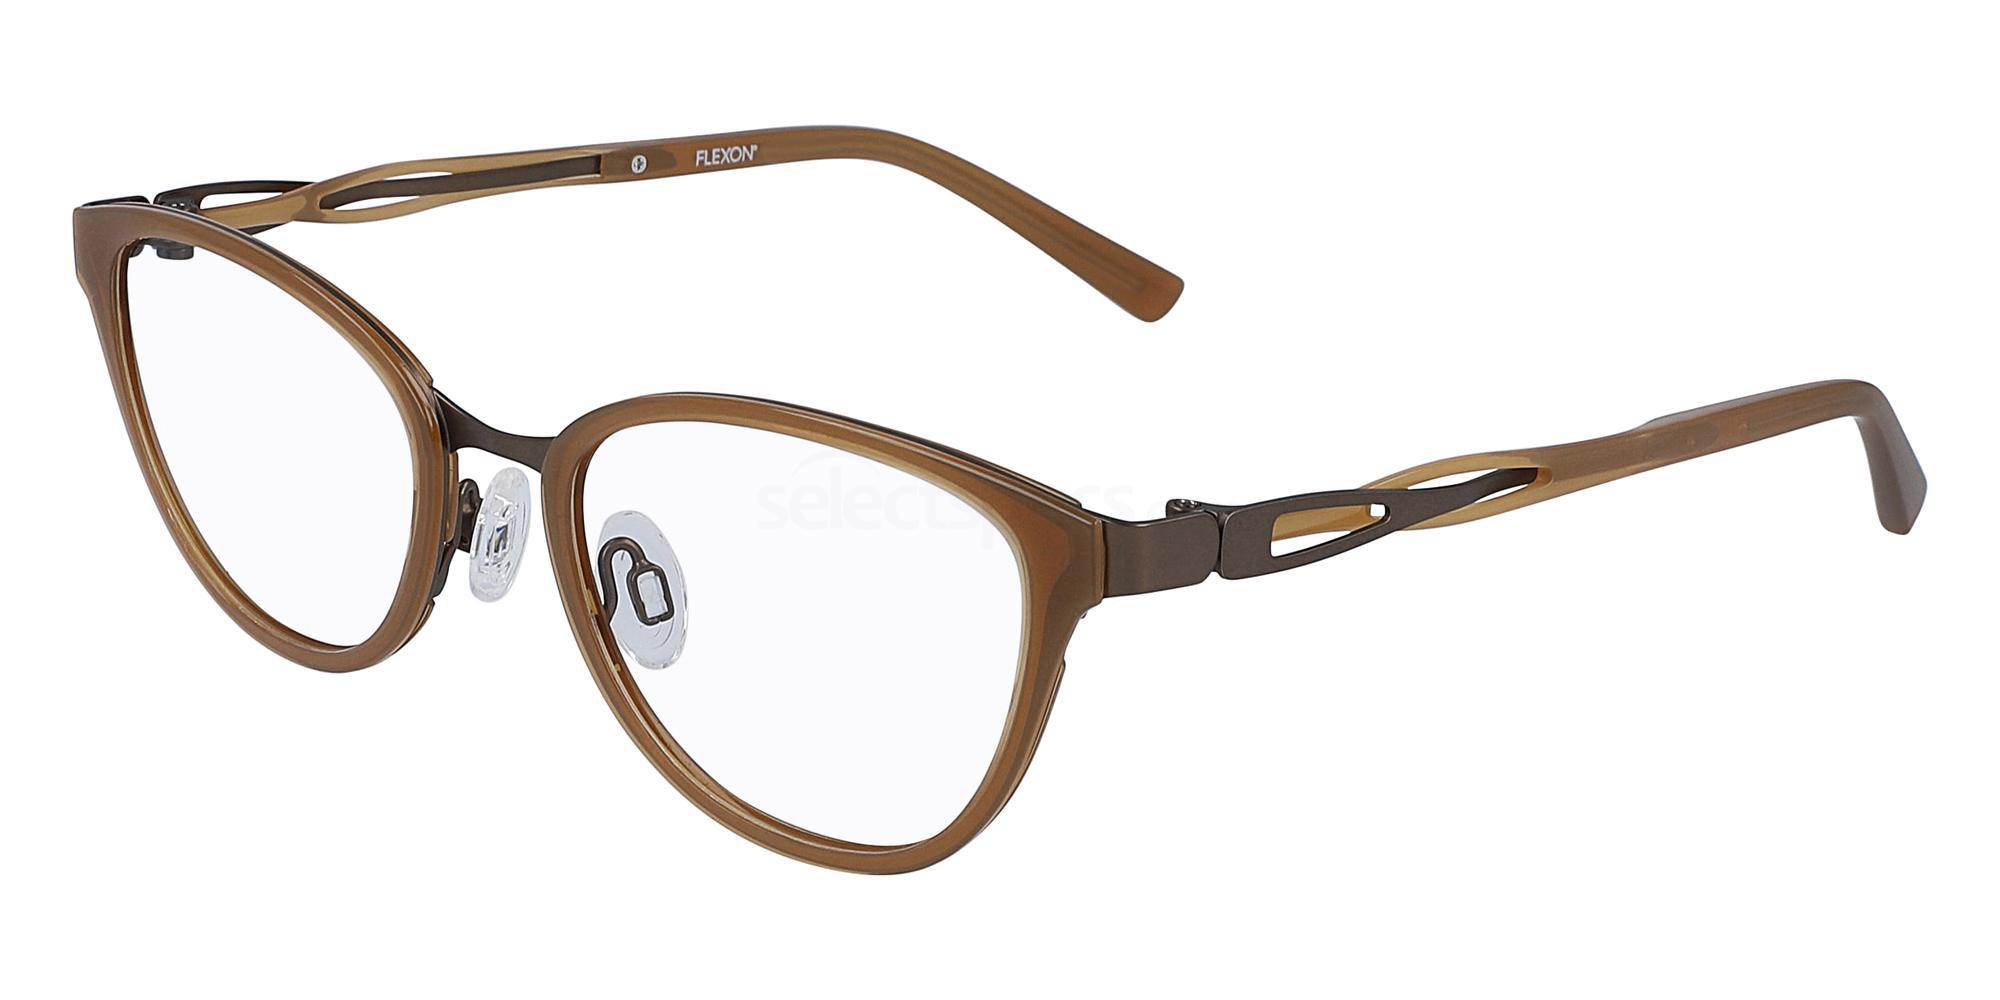 210 FLEXON W3011 Glasses, Flexon